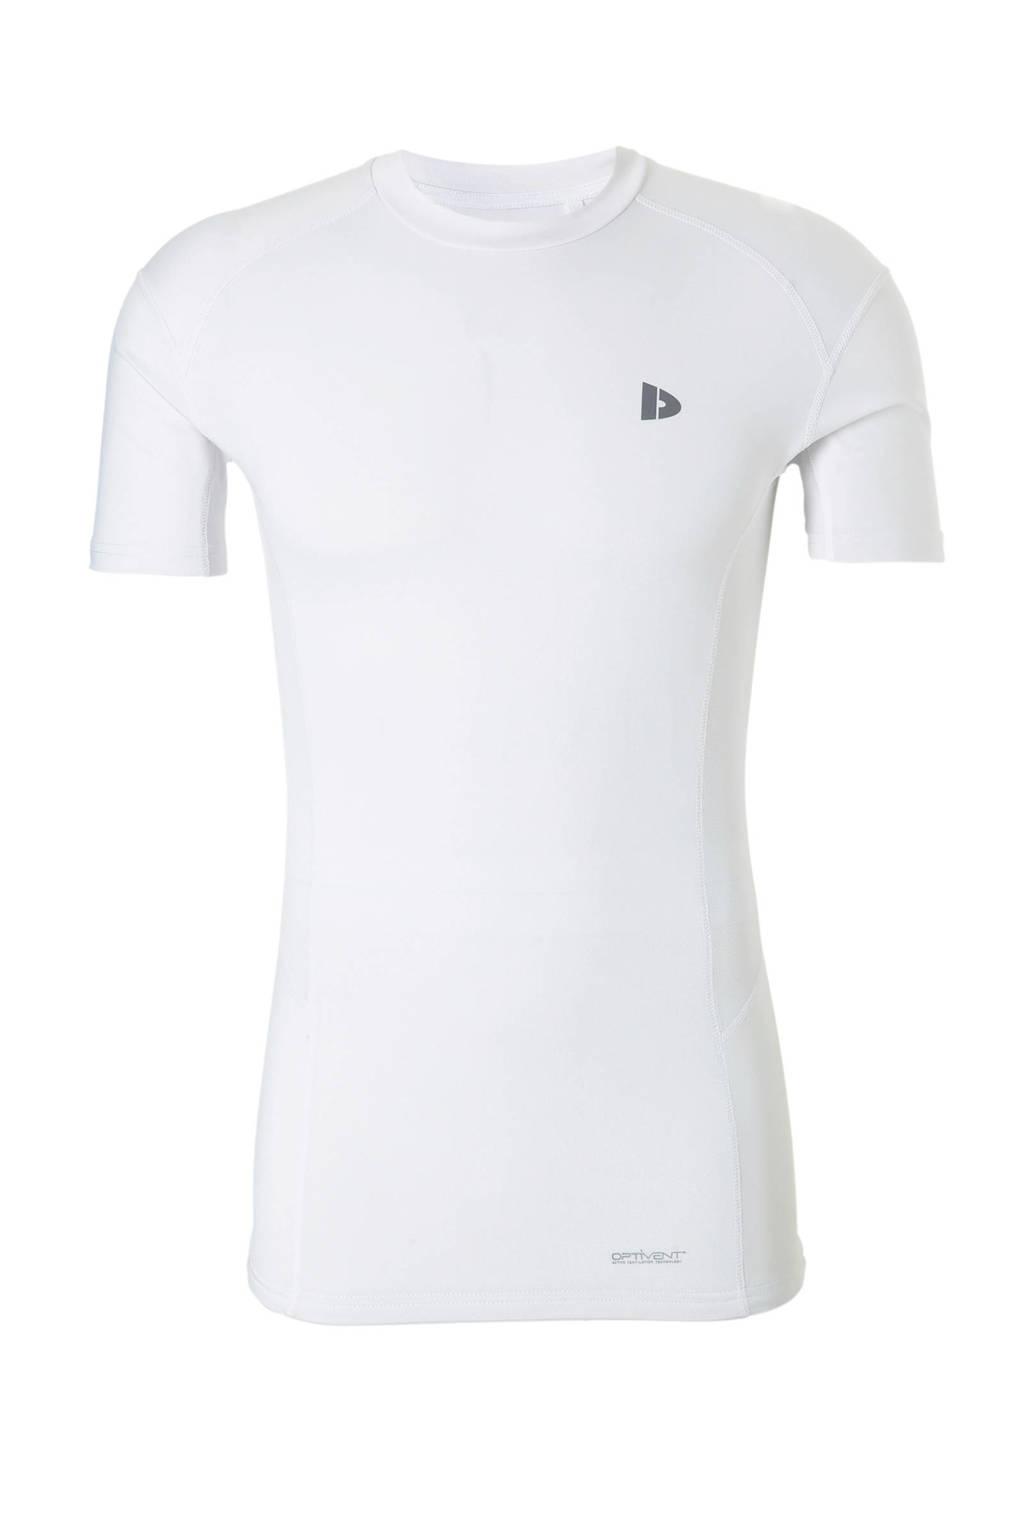 Donnay   sport T-shirt wit, Wit